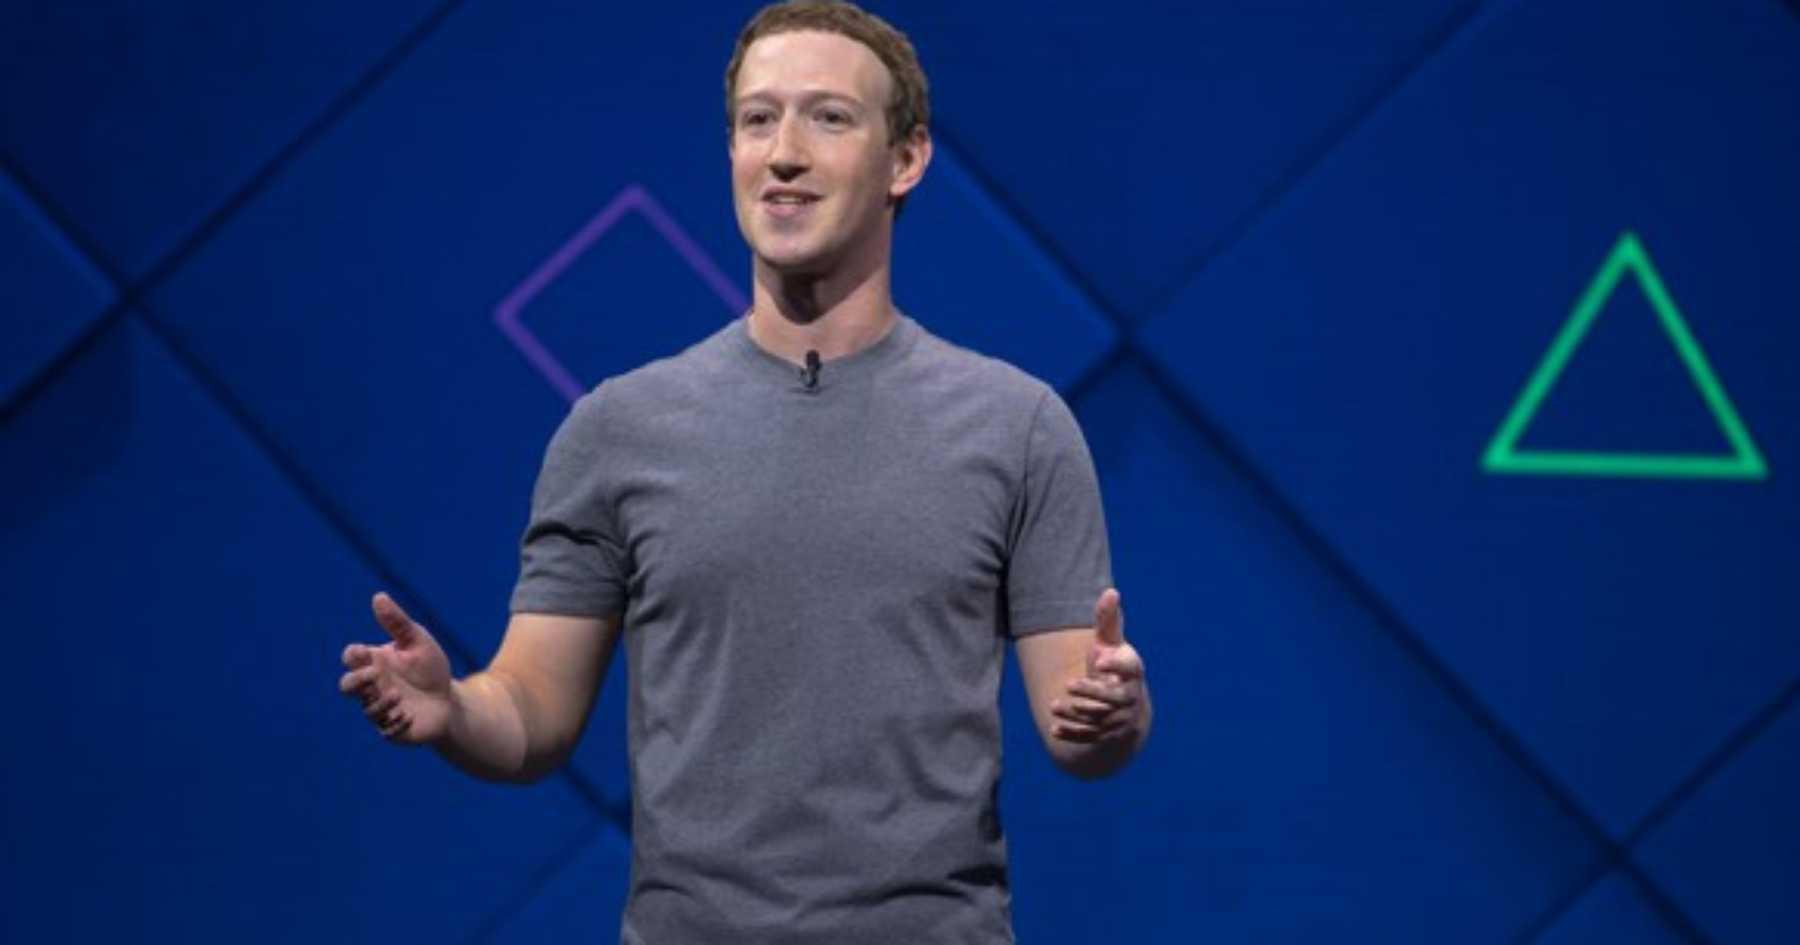 Here's how much Facebook spends on Mark Zuckerberg